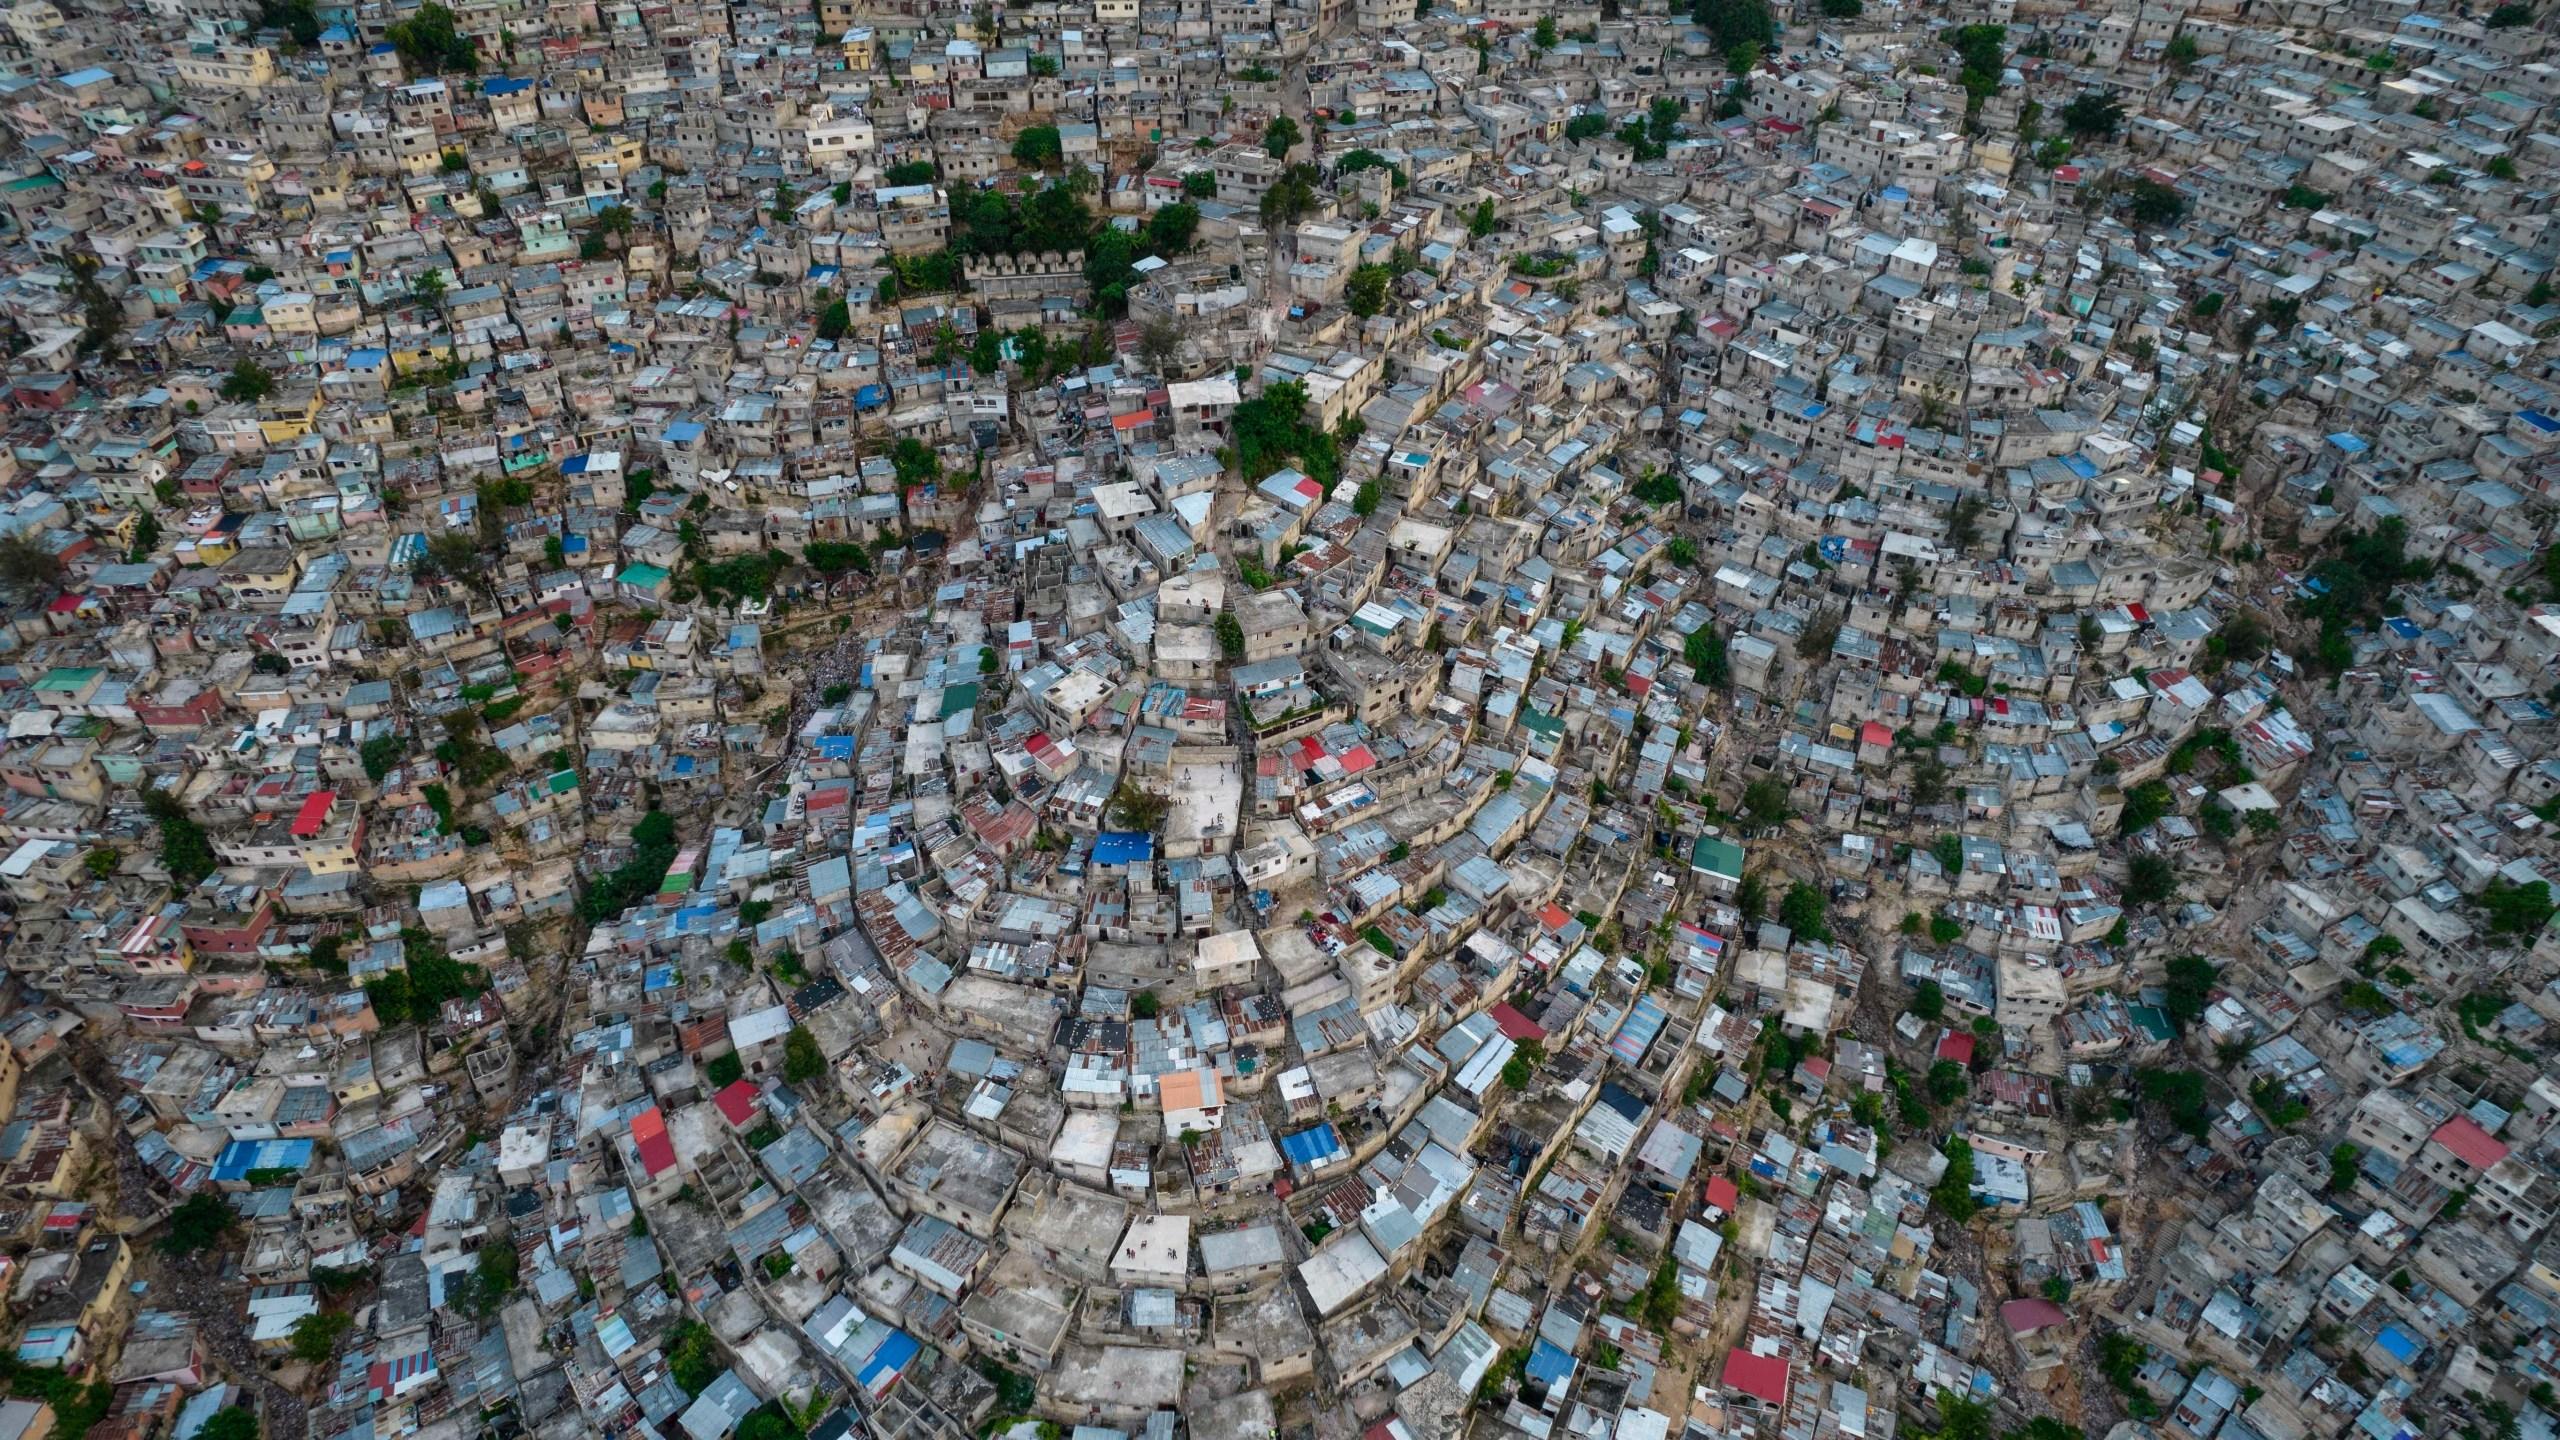 A view of the densely populated Jalousie neighborhood of Port-au-Prince, Tuesday, Sept. 28, 2021. (AP Photo/Rodrigo Abd, file)